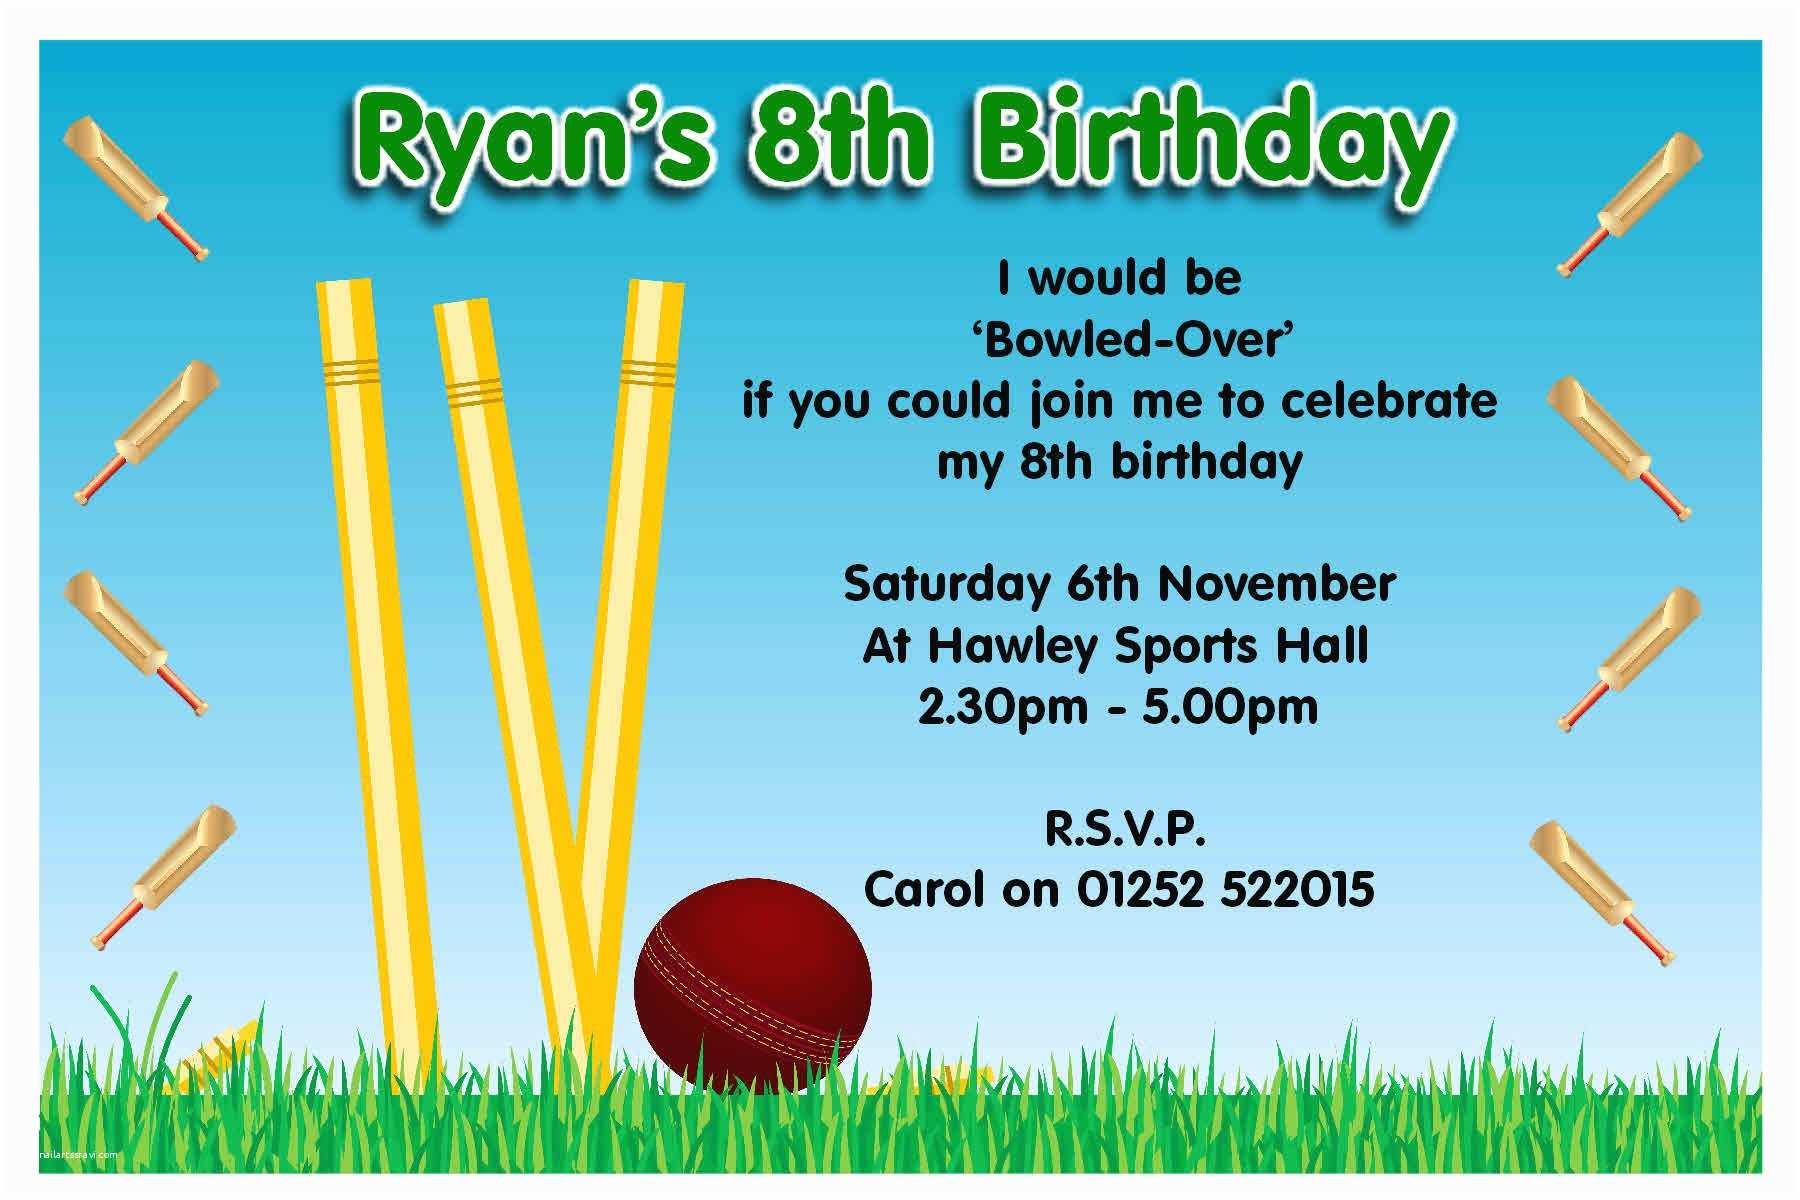 Birthday Party Invitations Online Birthday Party Invitation Line